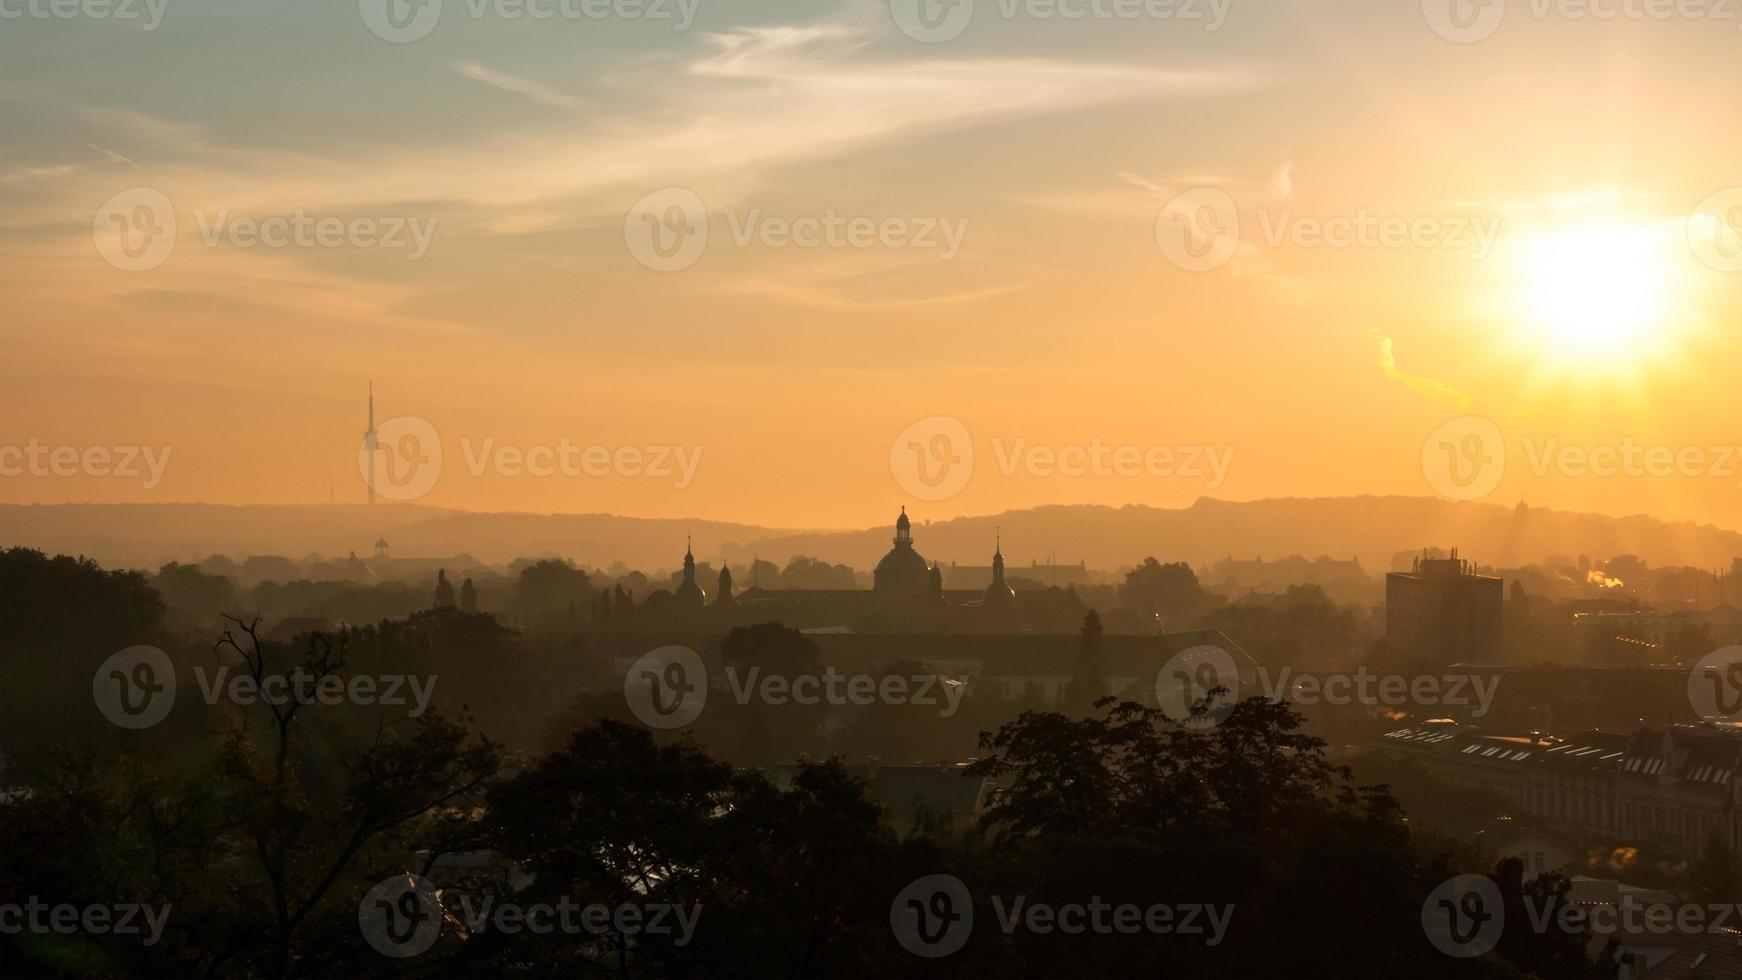 Skyline Potsdam, Germany photo